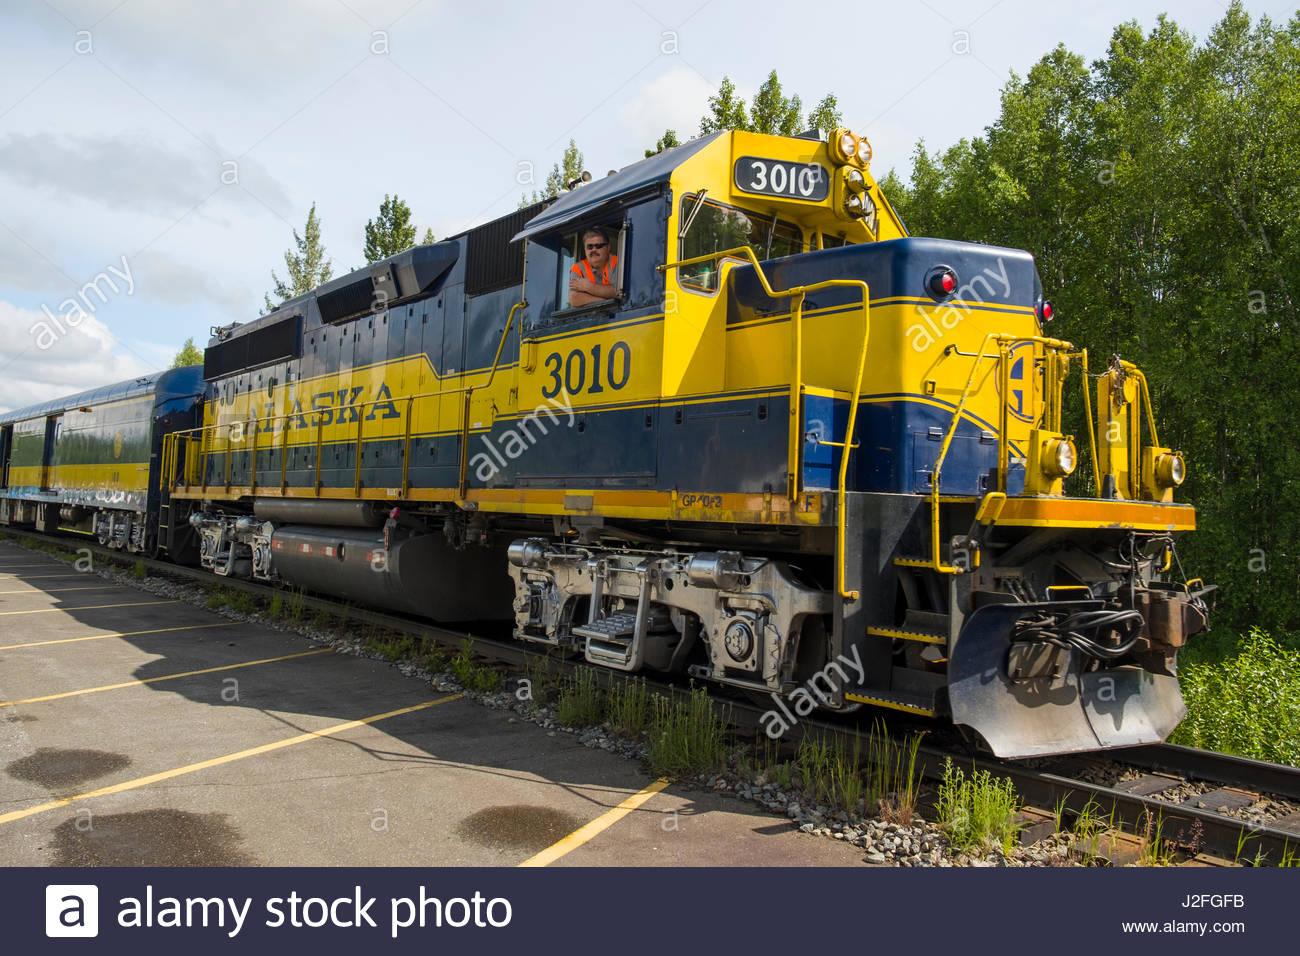 Alaska matanuska susitna county talkeetna - Alaska Railroad Hurricane Turn Diesel Electric Locomotive Talkeetna Matanuska Susitna Alaska